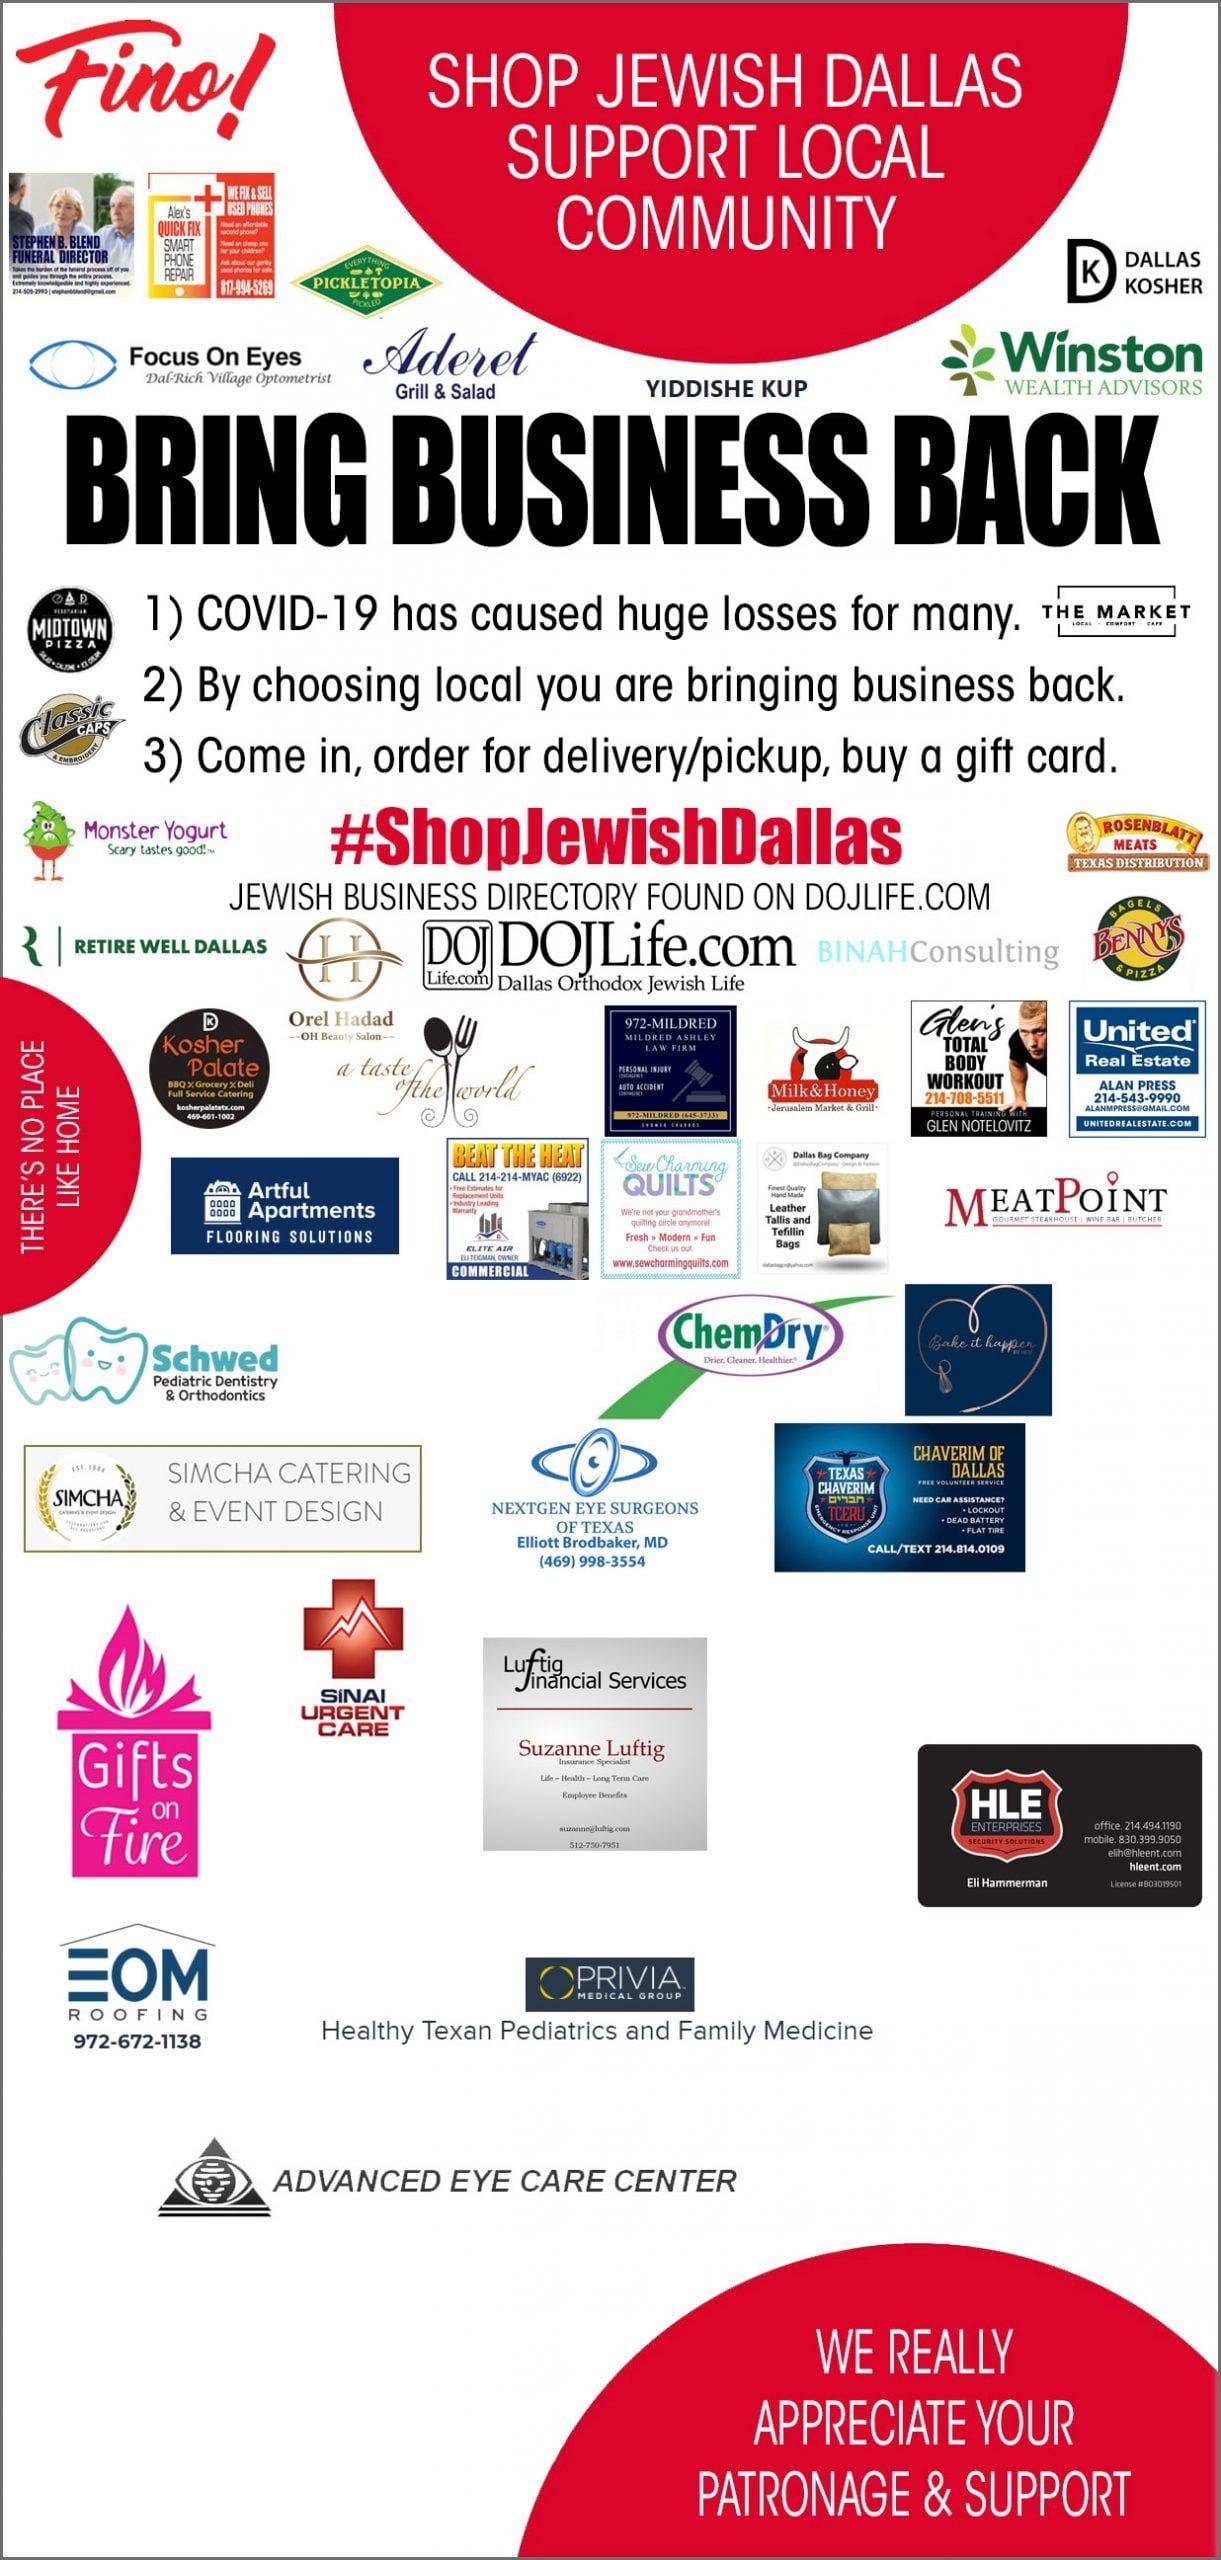 #ShopJewishDallas - Bring Business Back Initiative 1